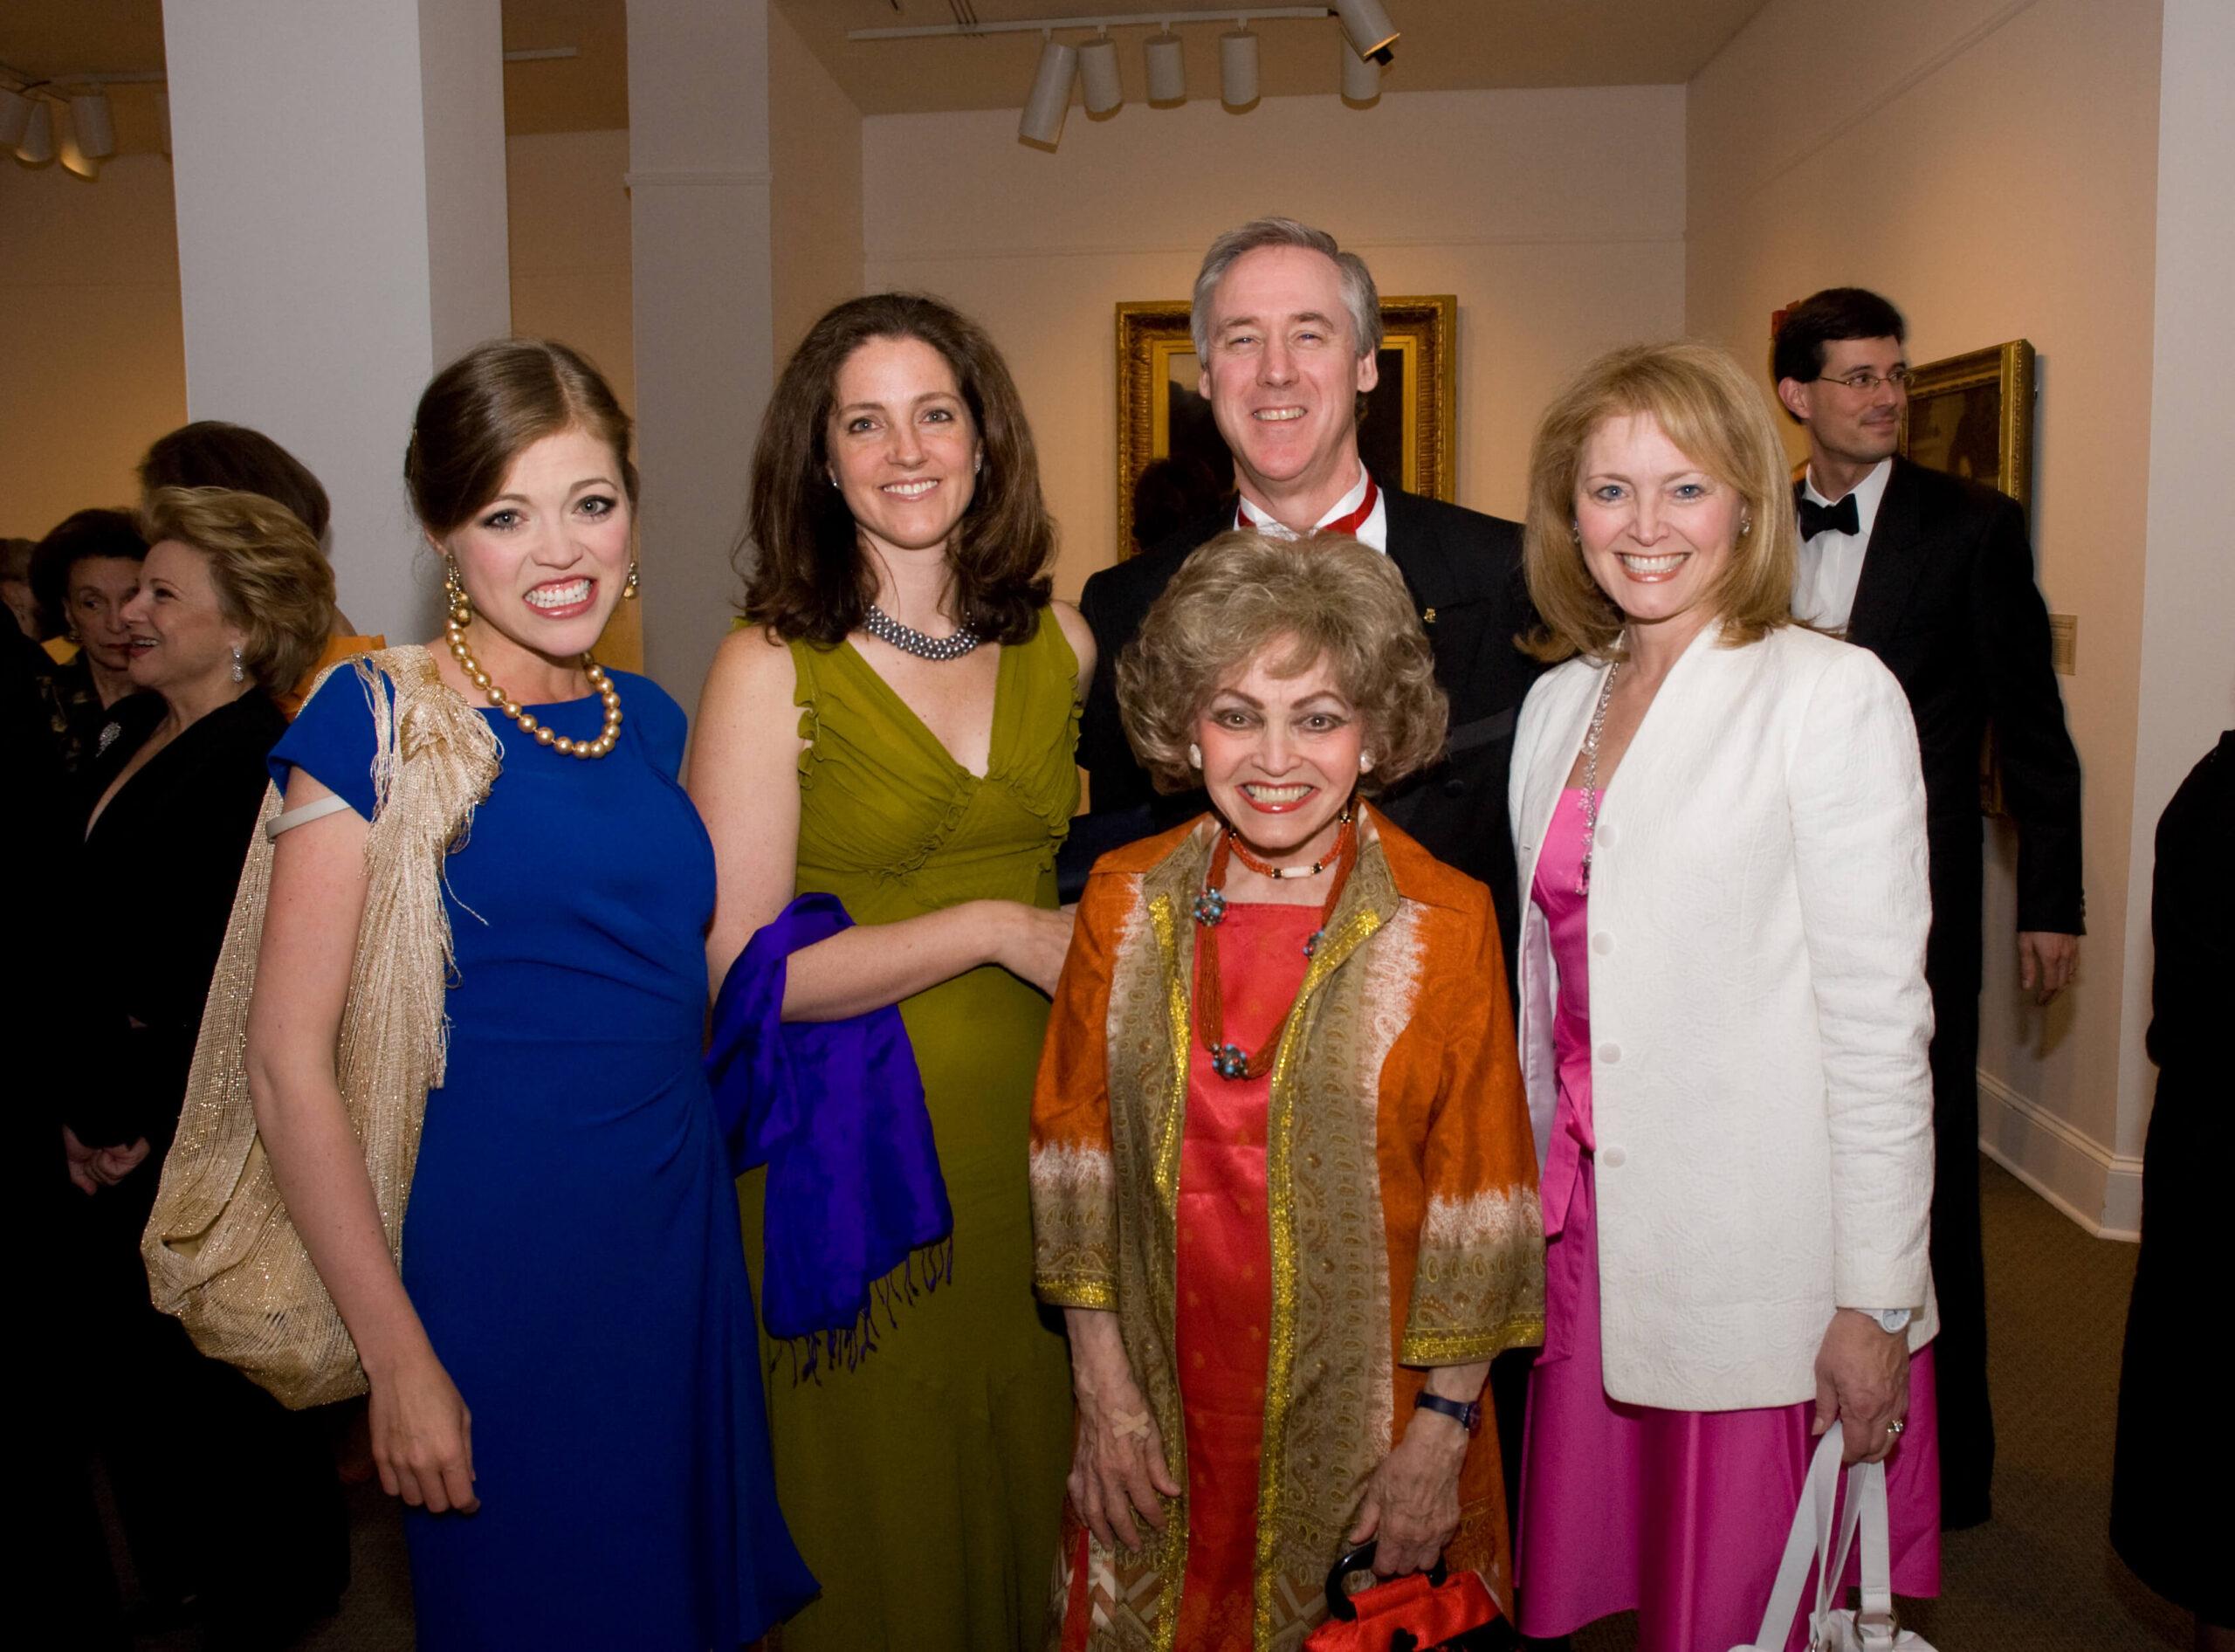 Ms. Charity Sunshine Tillemann-Dick, Mrs. Wendy Teleki, Ambassadr Richard Swett, Mrs. Anette Lantos, Dr. KatrinLantos-Swett